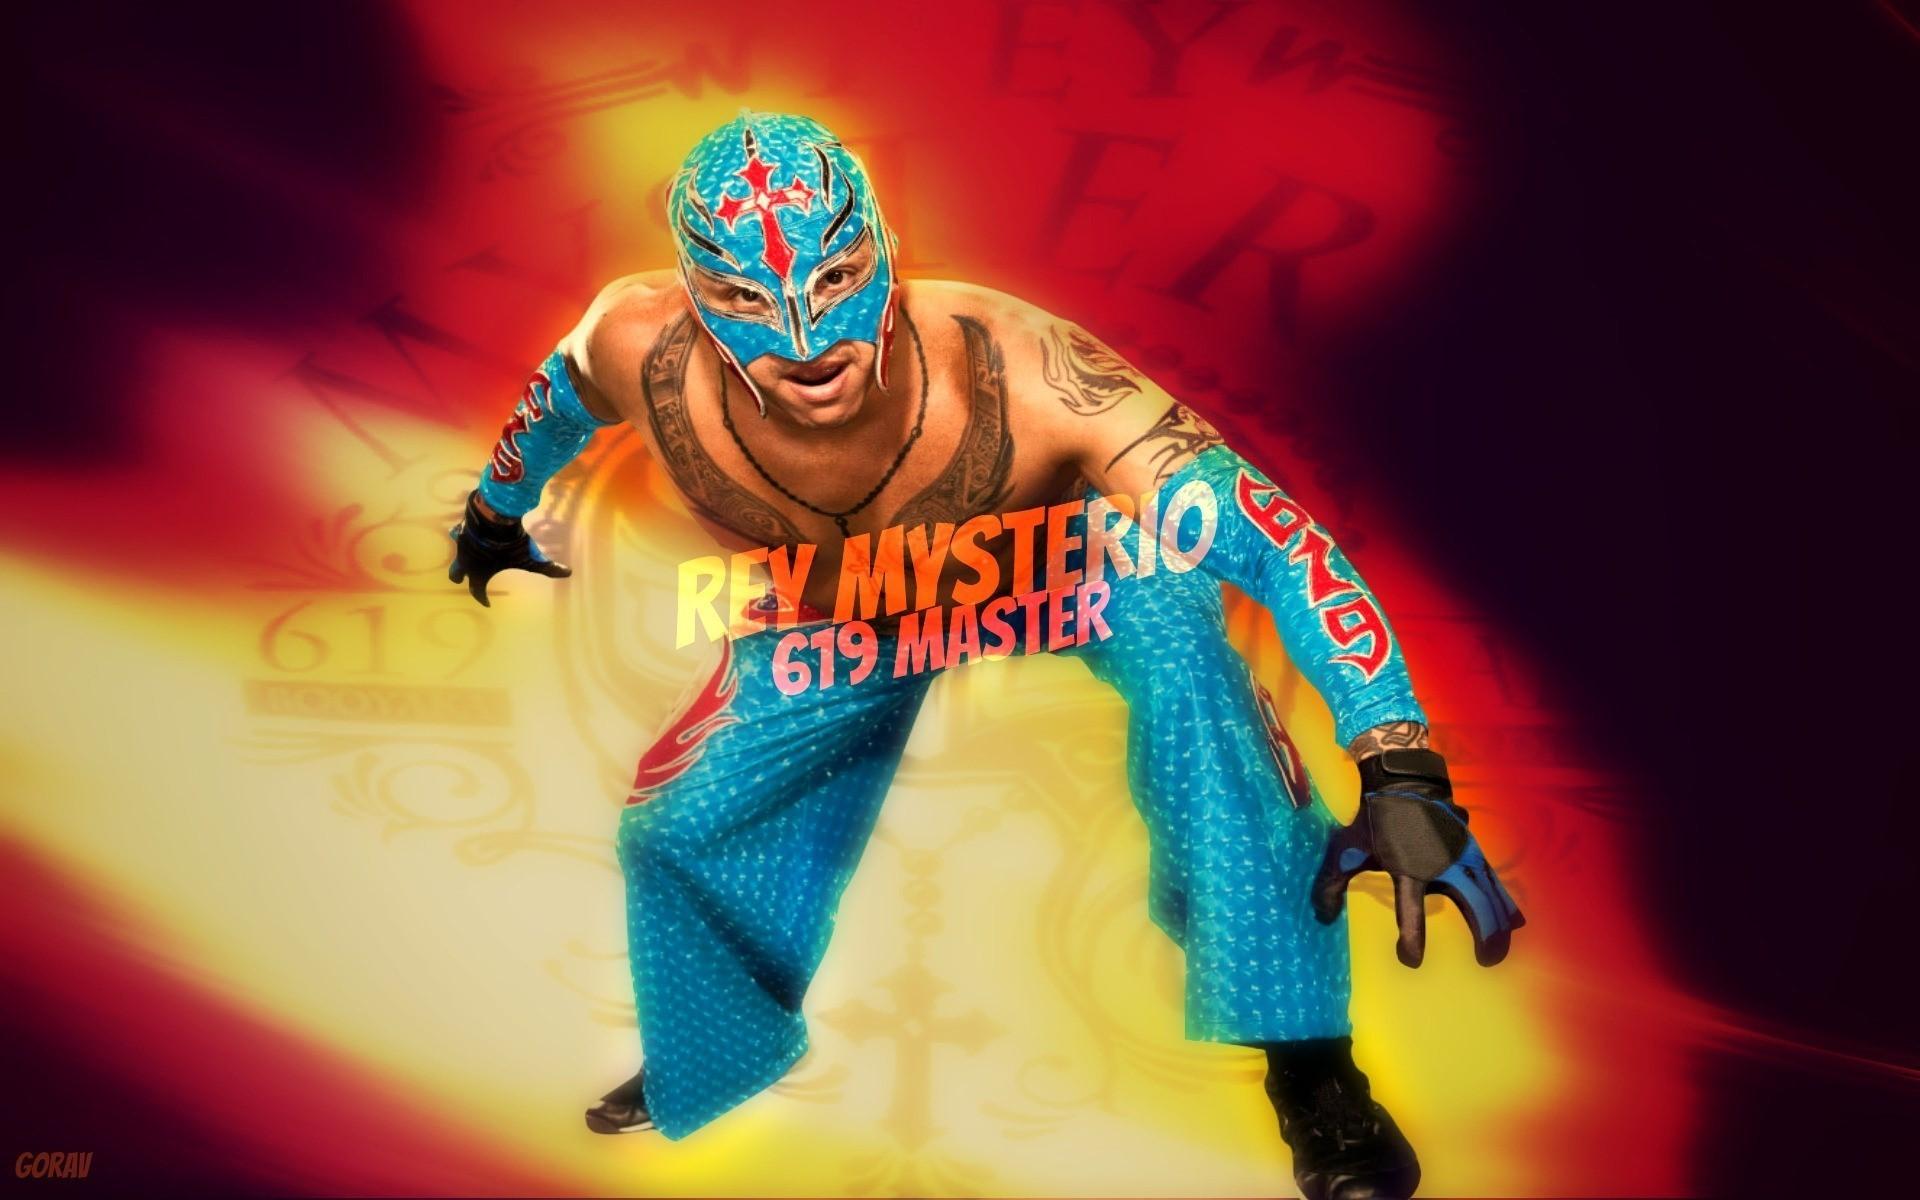 HD WWE Rey Mysterio Wallpapers HD Wallpapers. Wwe Wallpapers Hd. View .